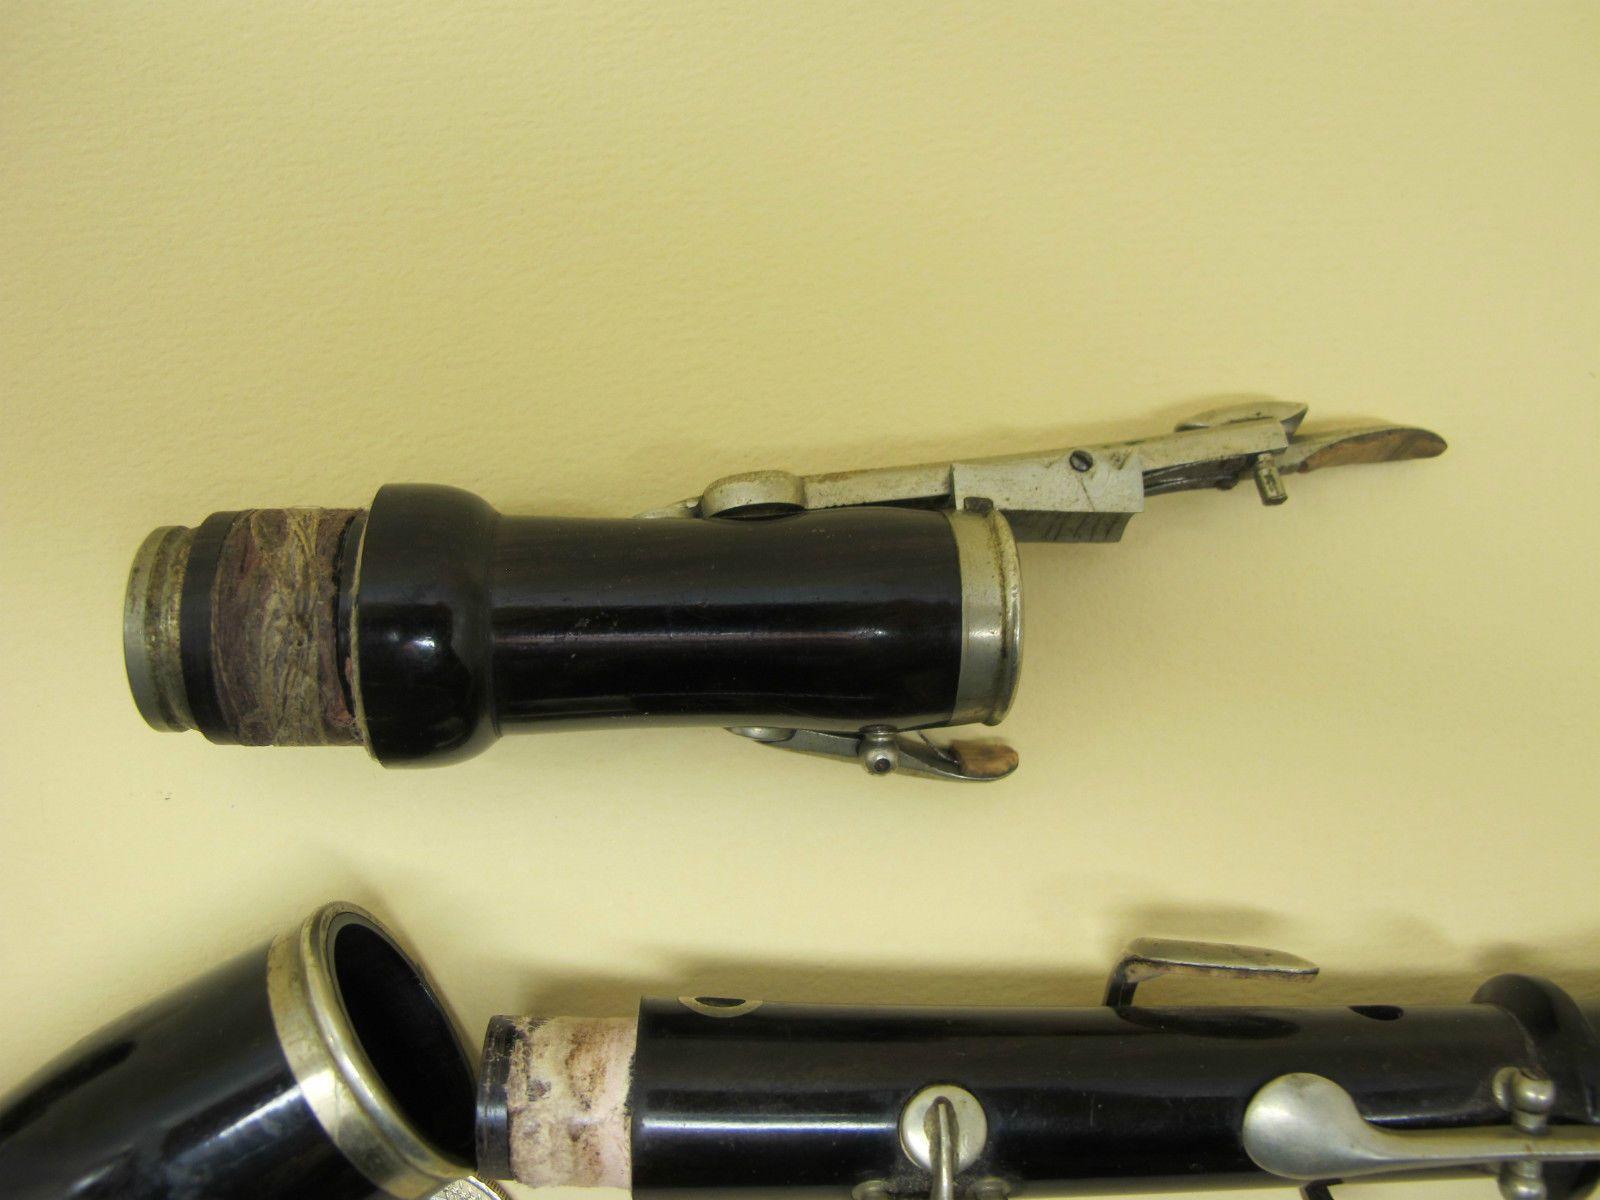 XIXème flageolet, flajol, flauvo piccolo Bois EBENE 38cm RARE+++ ...